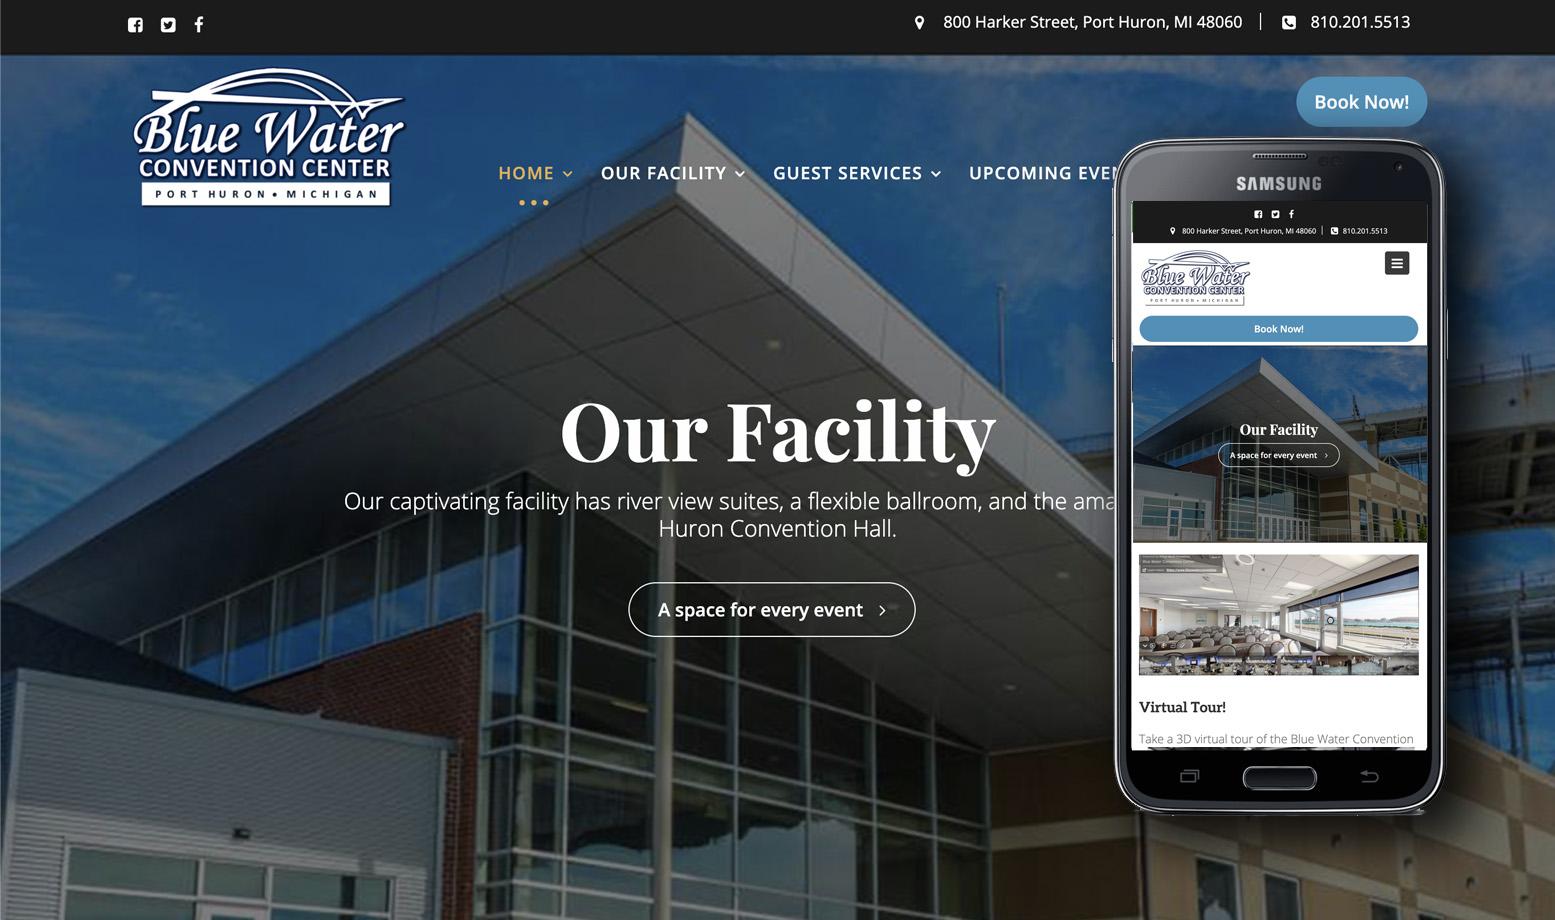 website design event venues, halls, convention centers